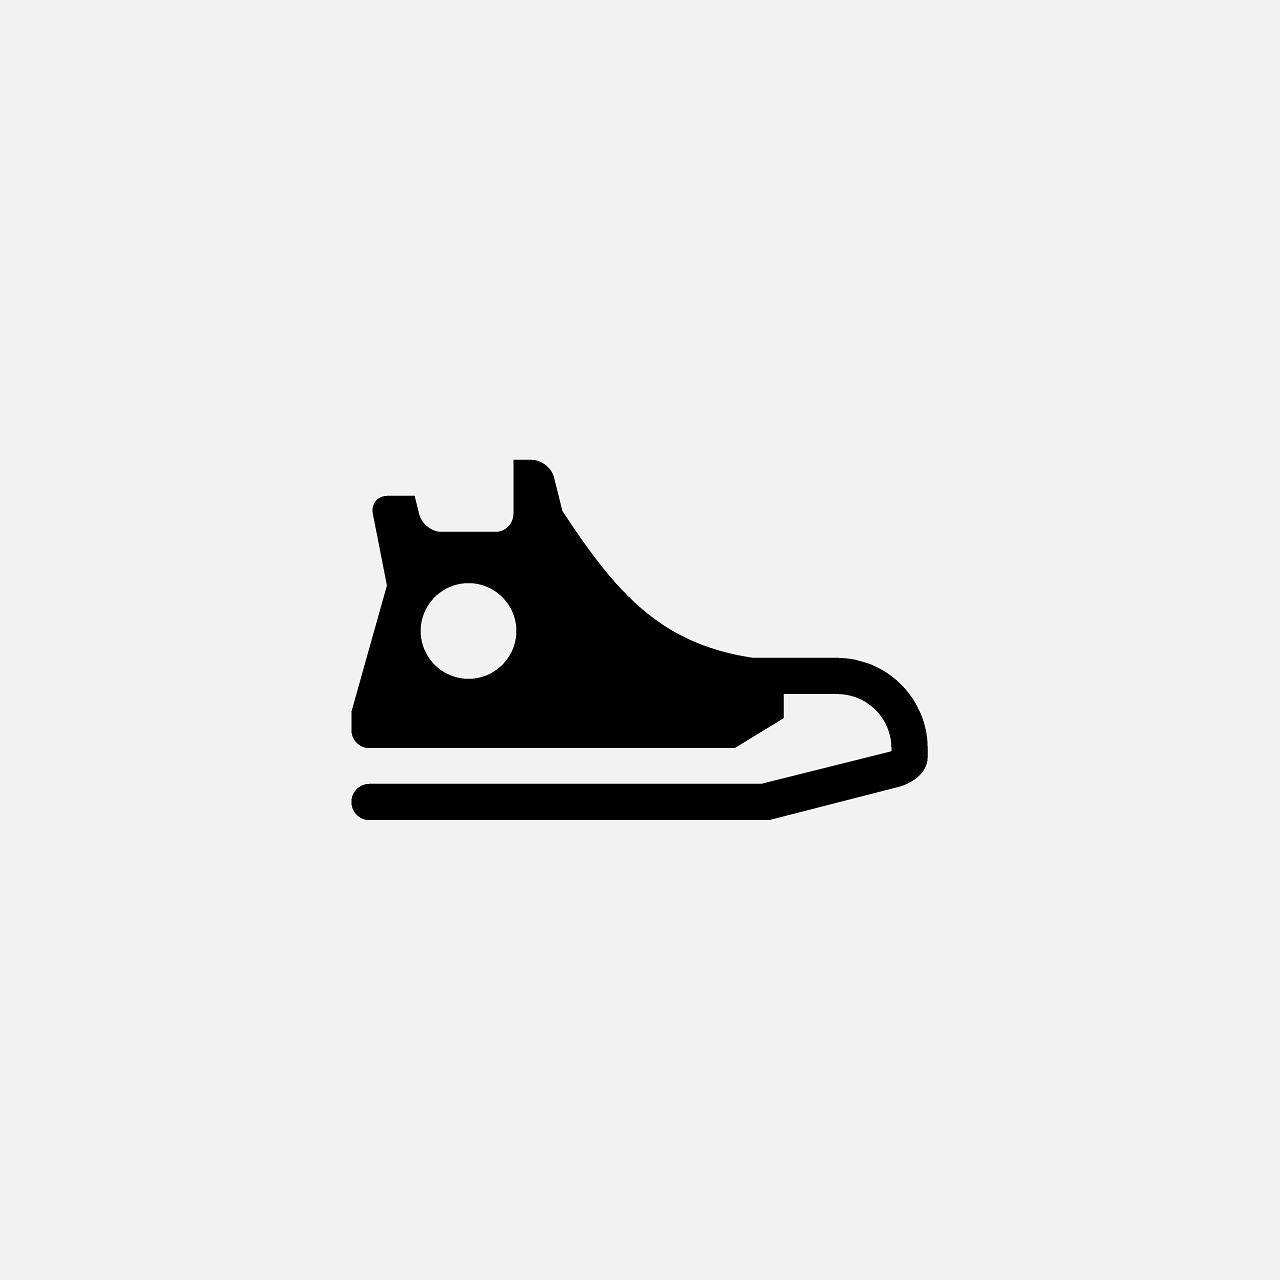 converse icon